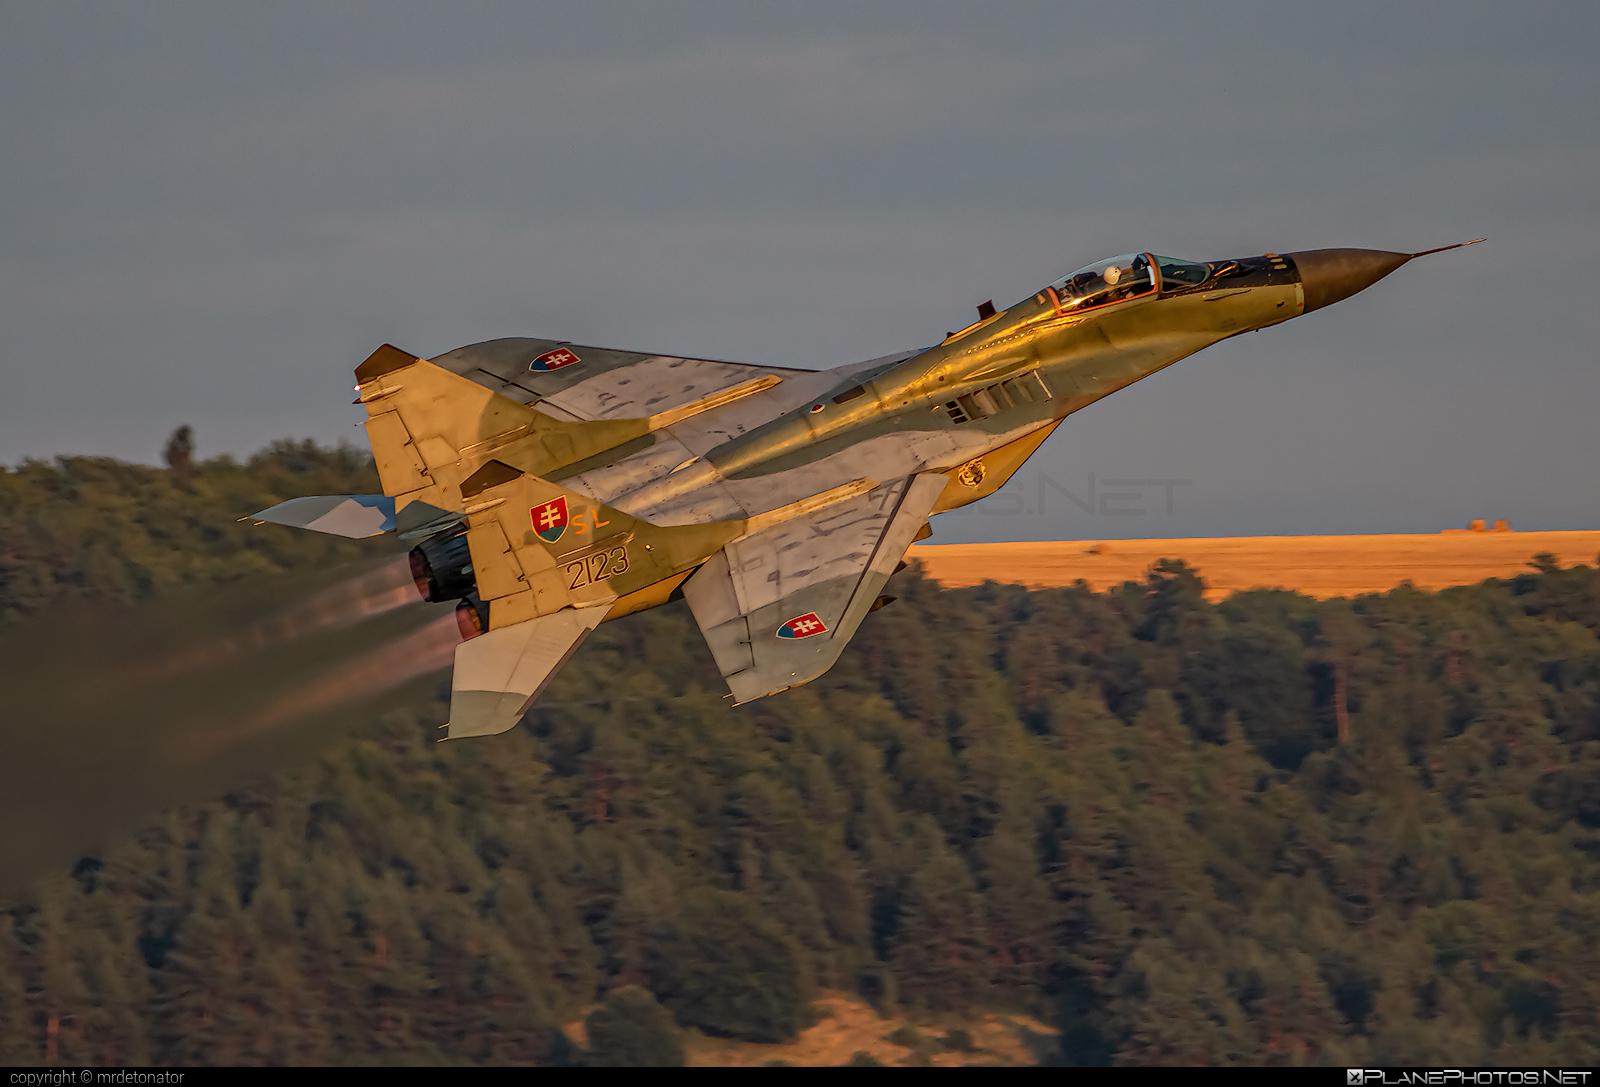 Mikoyan-Gurevich MiG-29AS - 2123 operated by Vzdušné sily OS SR (Slovak Air Force) #mig #mig29 #mig29as #mikoyangurevich #slovakairforce #vzdusnesilyossr